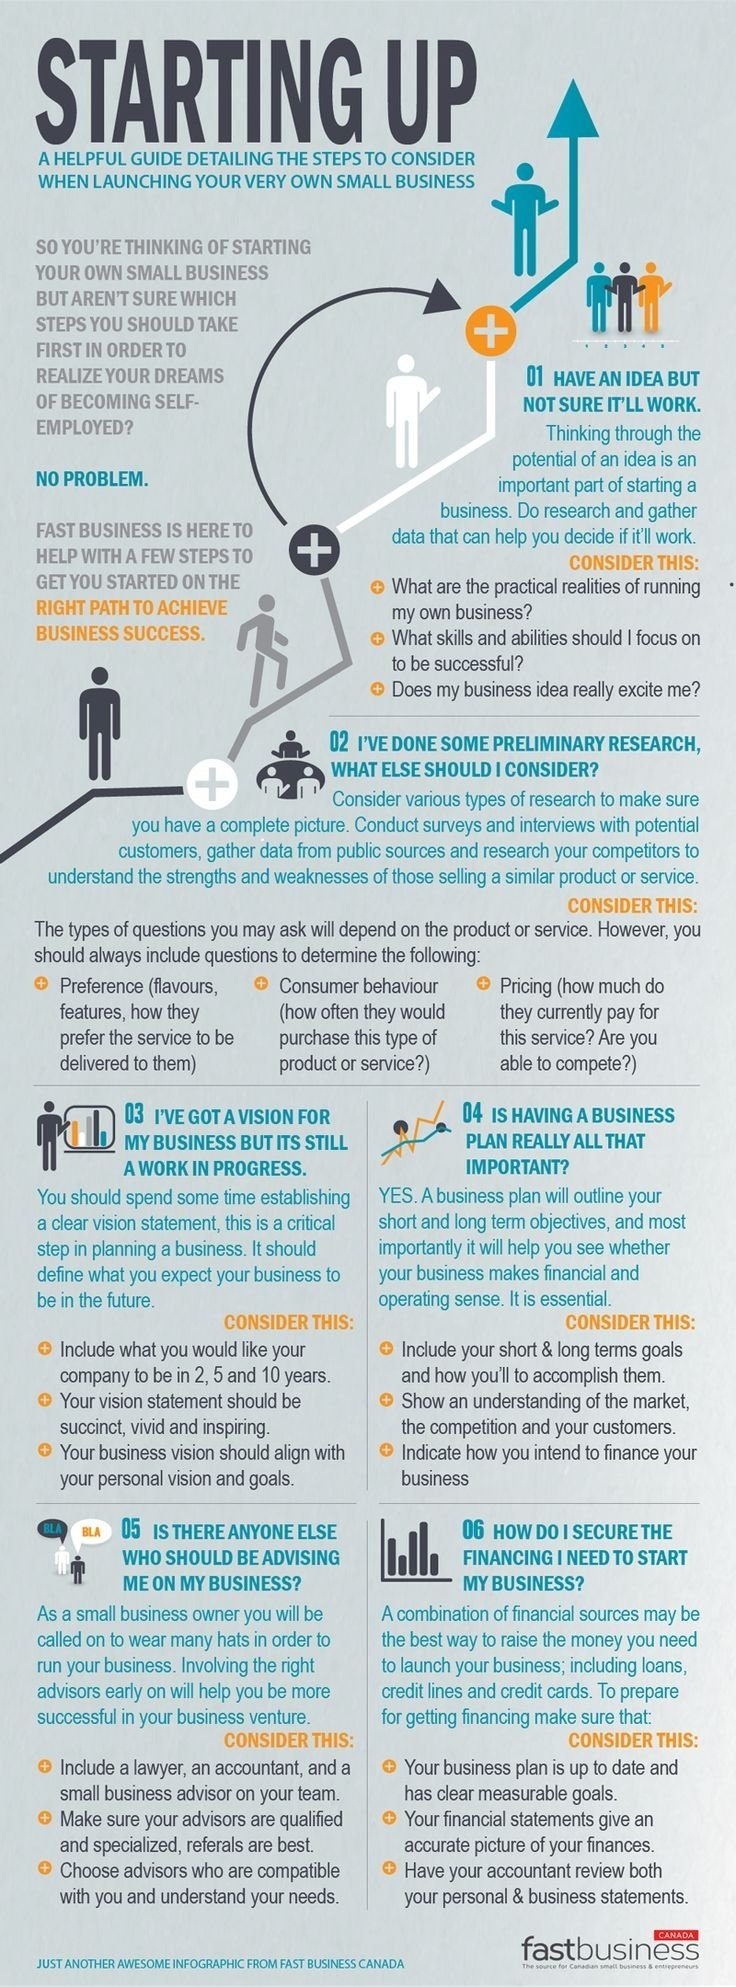 10 Trendy I Have A Business Idea 123 best starting a business images on pinterest entrepreneurship 1 2020